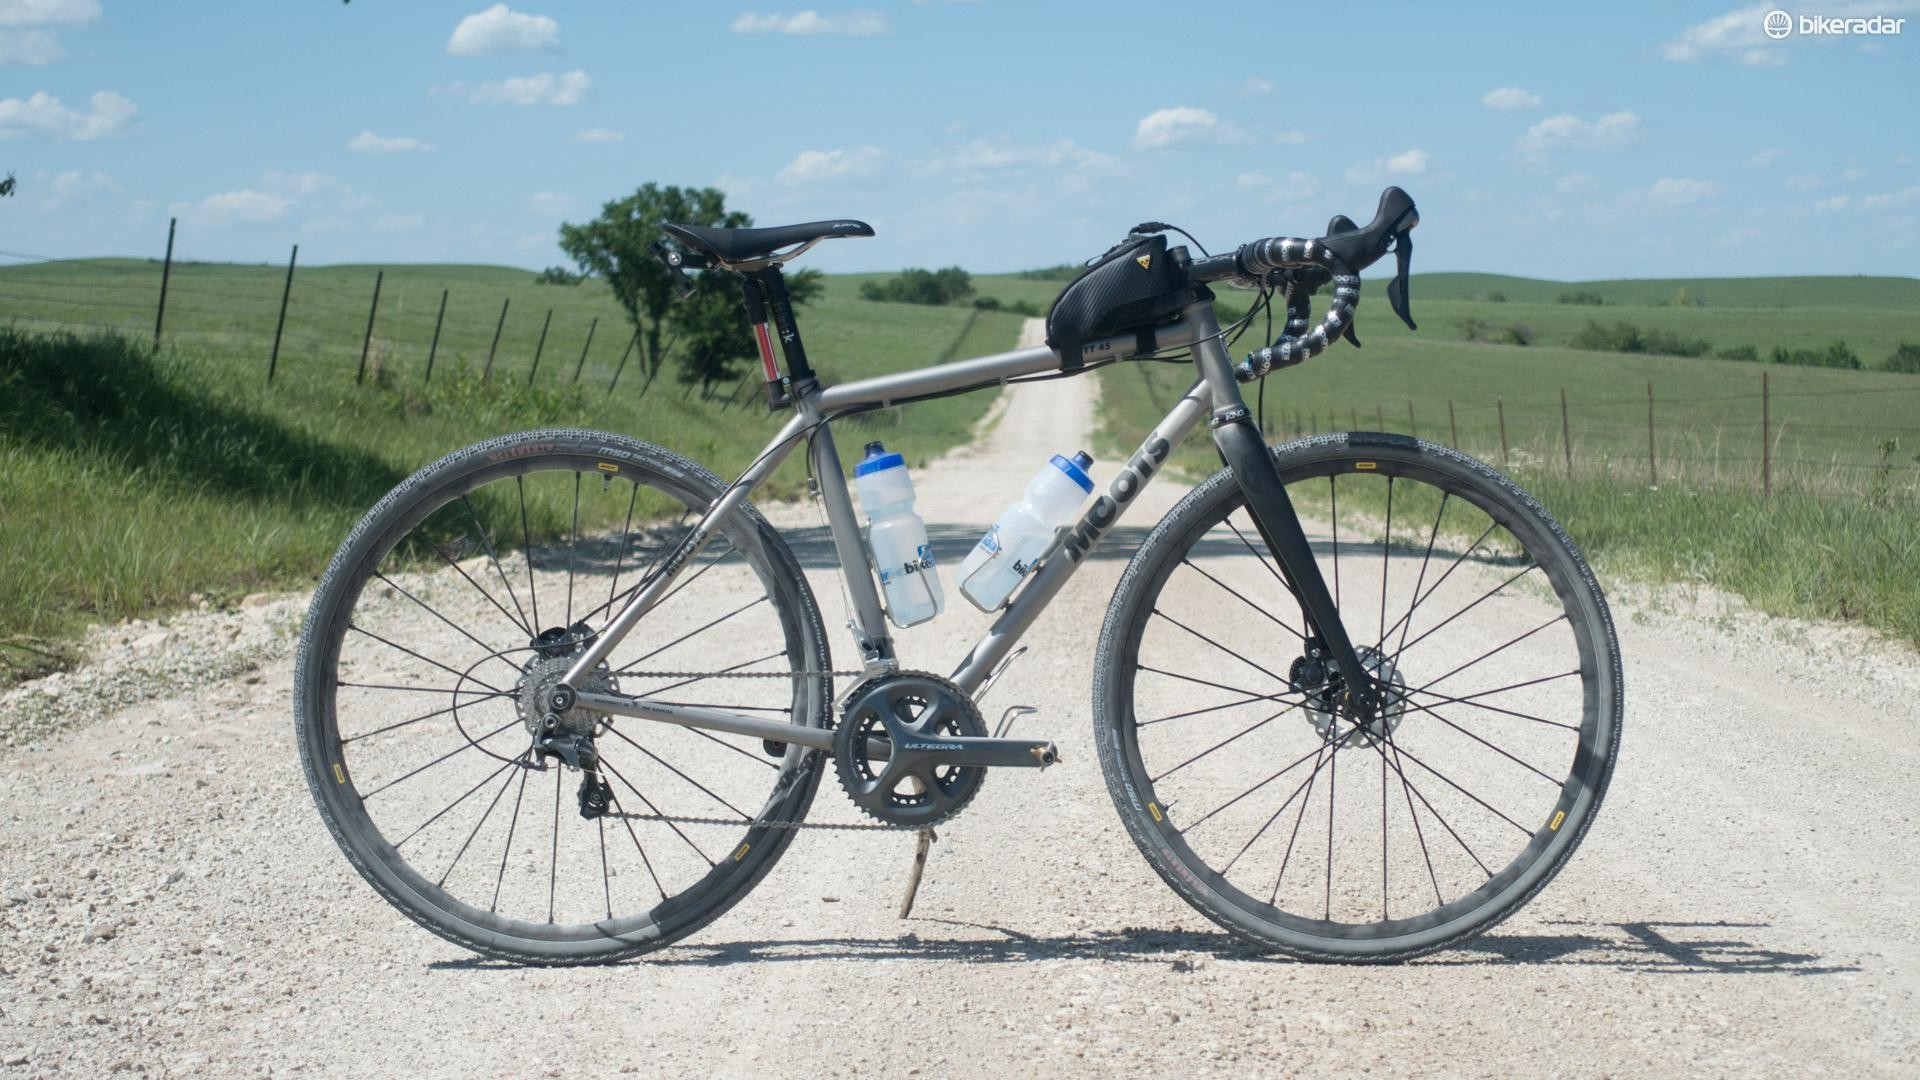 11spd: This week's best new bike gear - BikeRadar